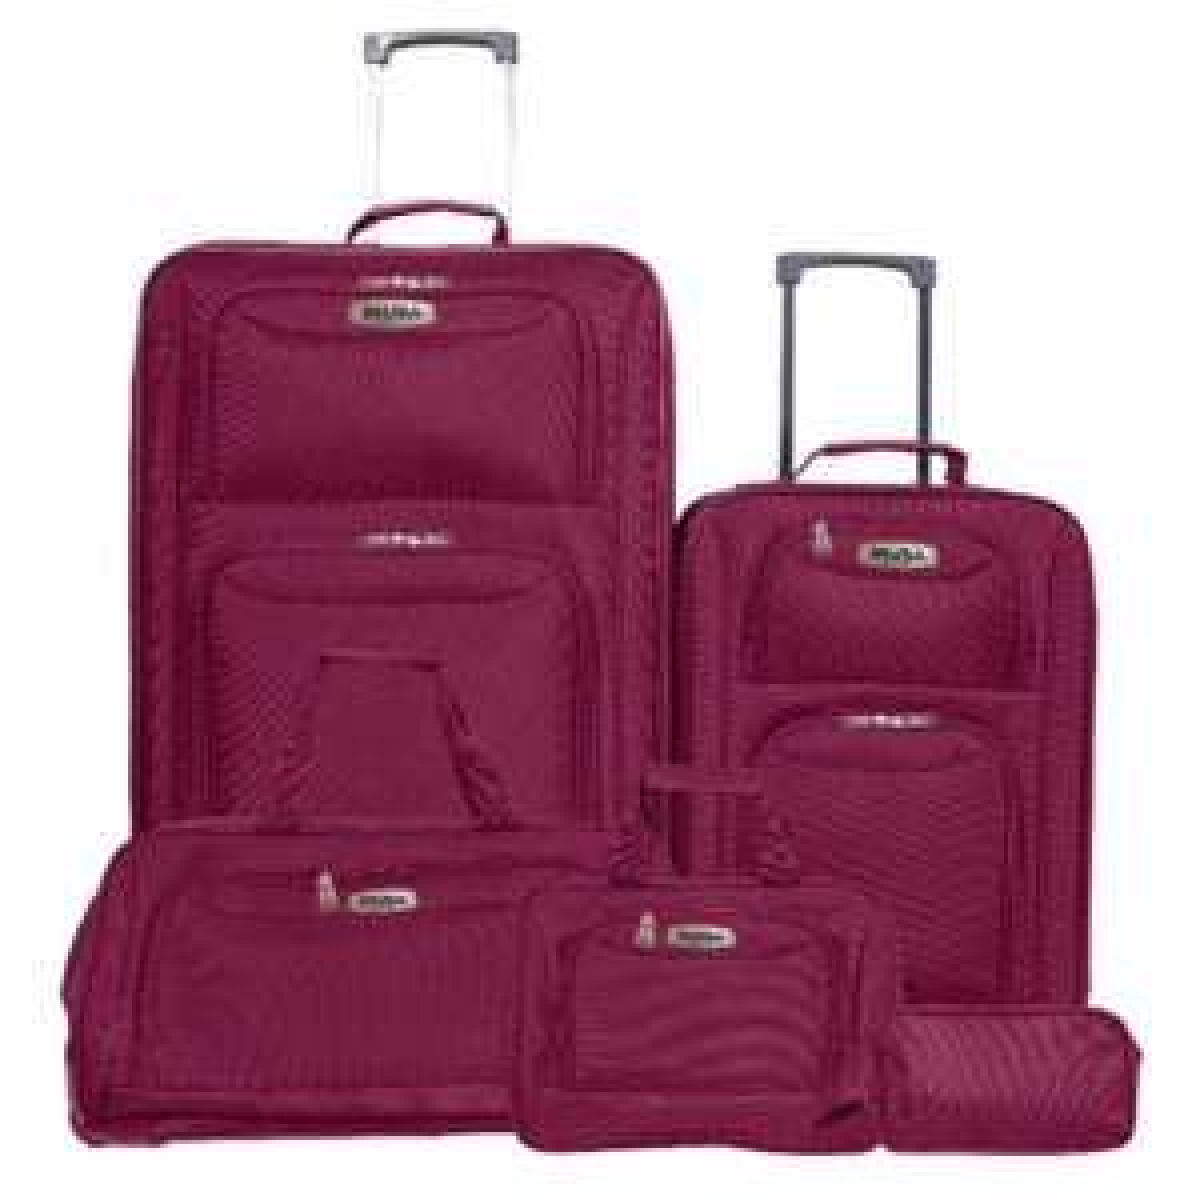 Sears en línea: Set 5 Pzas (maletas) 20 28 Bolsa Rod Cosmetiq y Tollet Vn Inusa